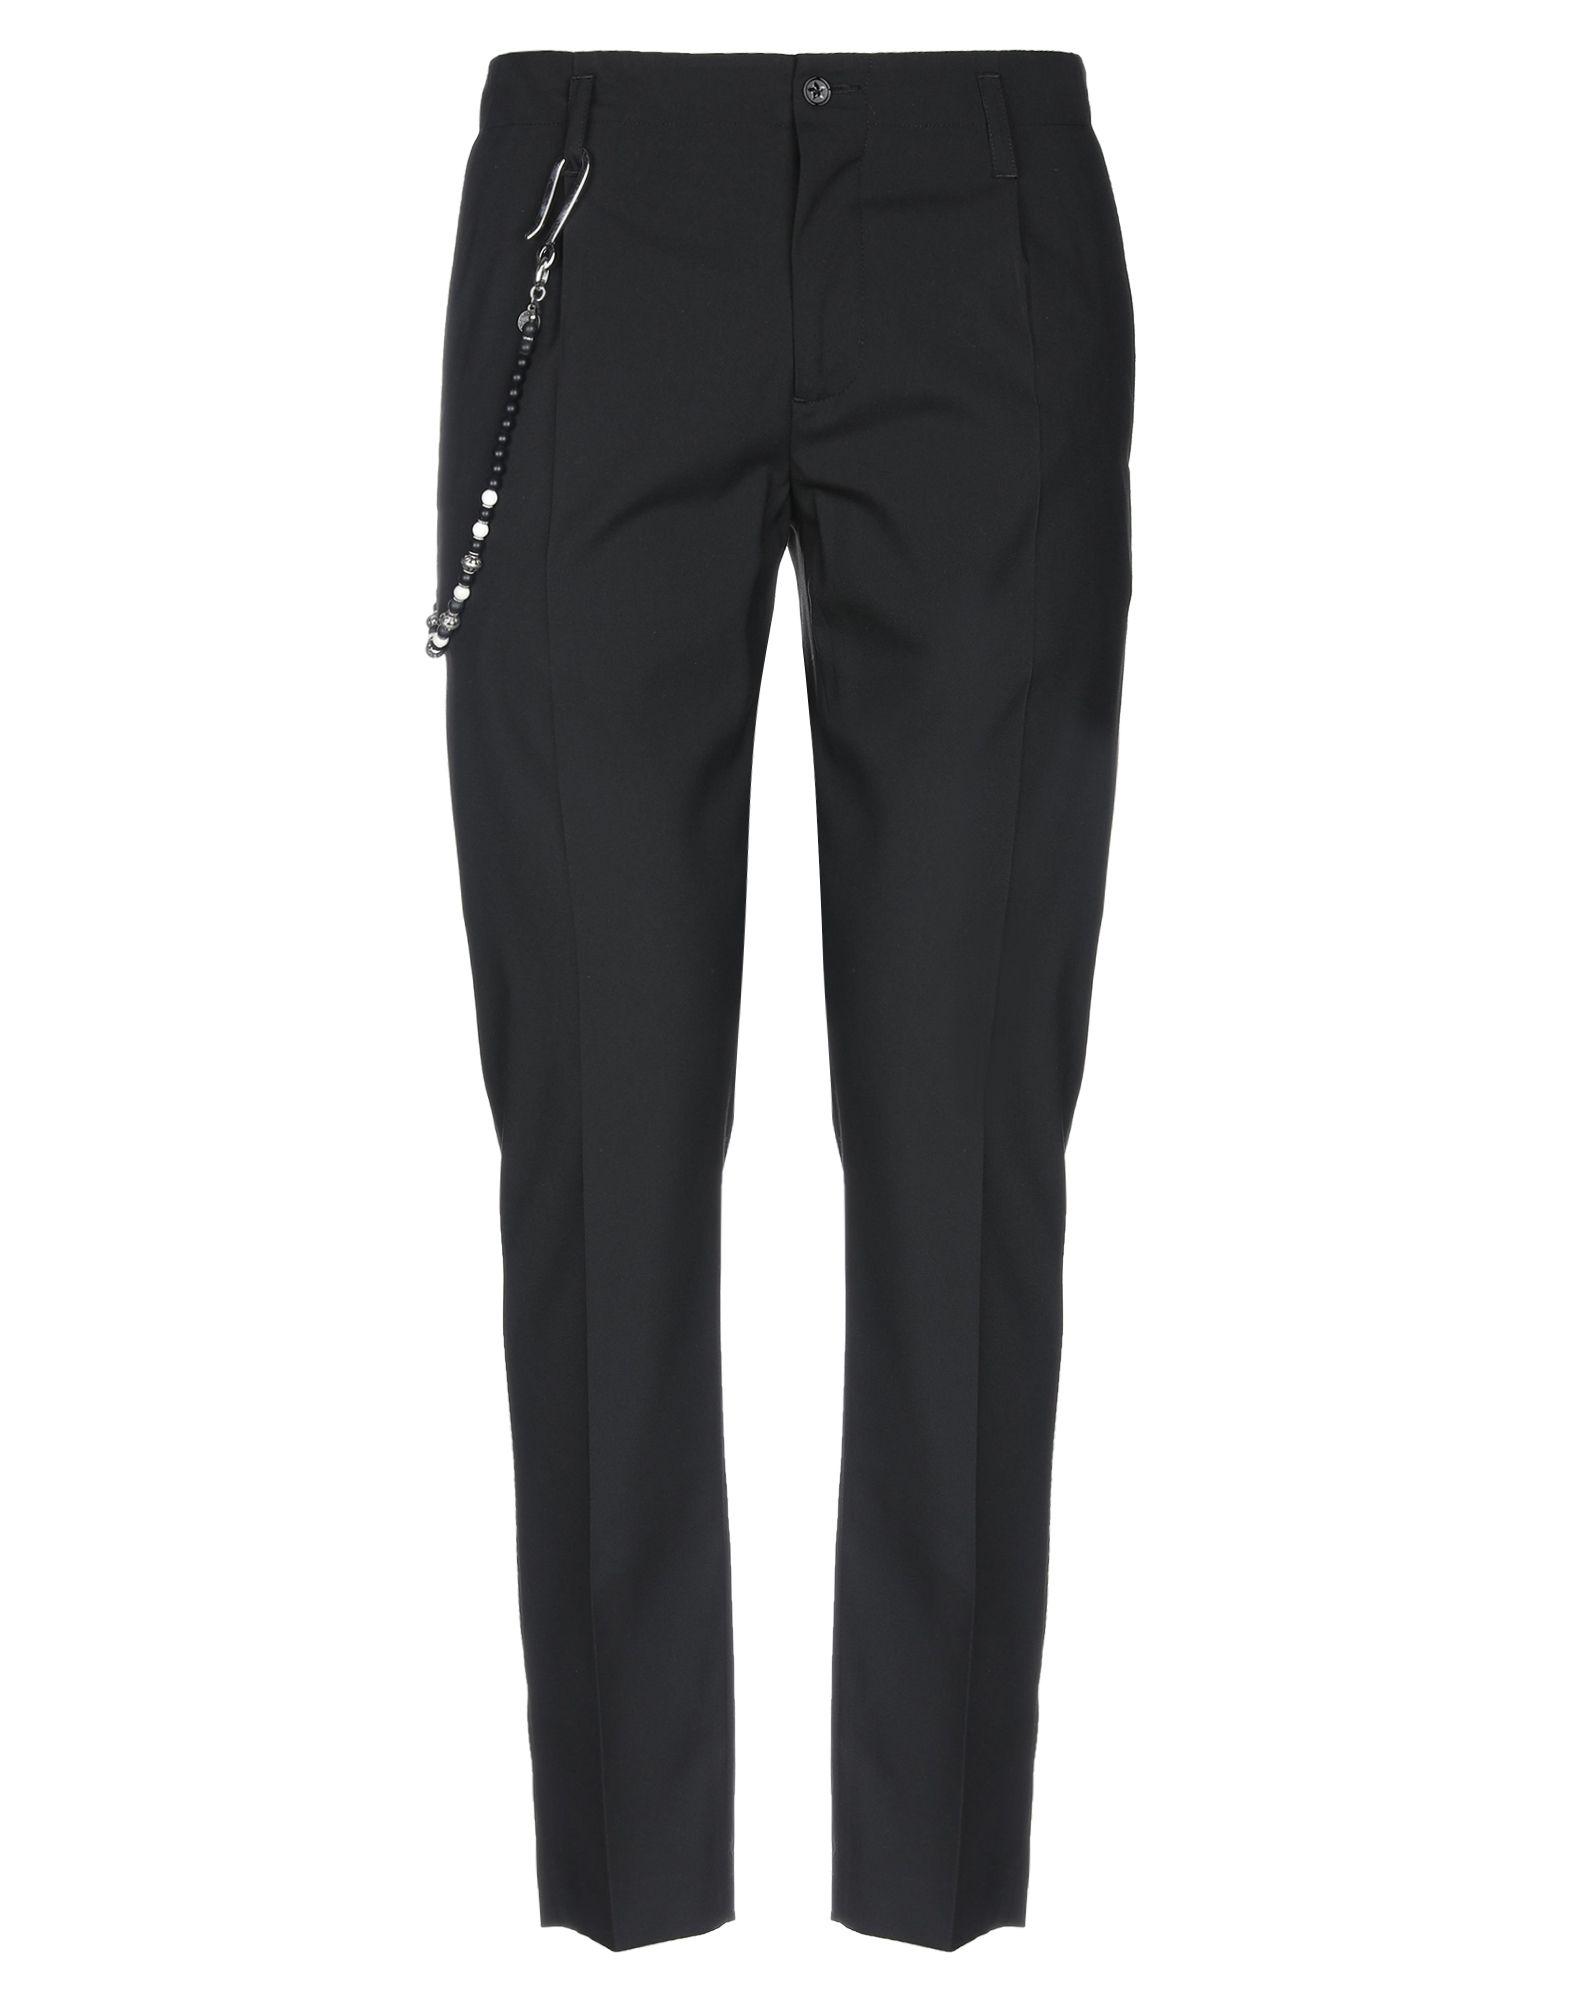 Pantalone grigio grigio grigio Daniele Alessandrini uomo - 13348768JN b1c